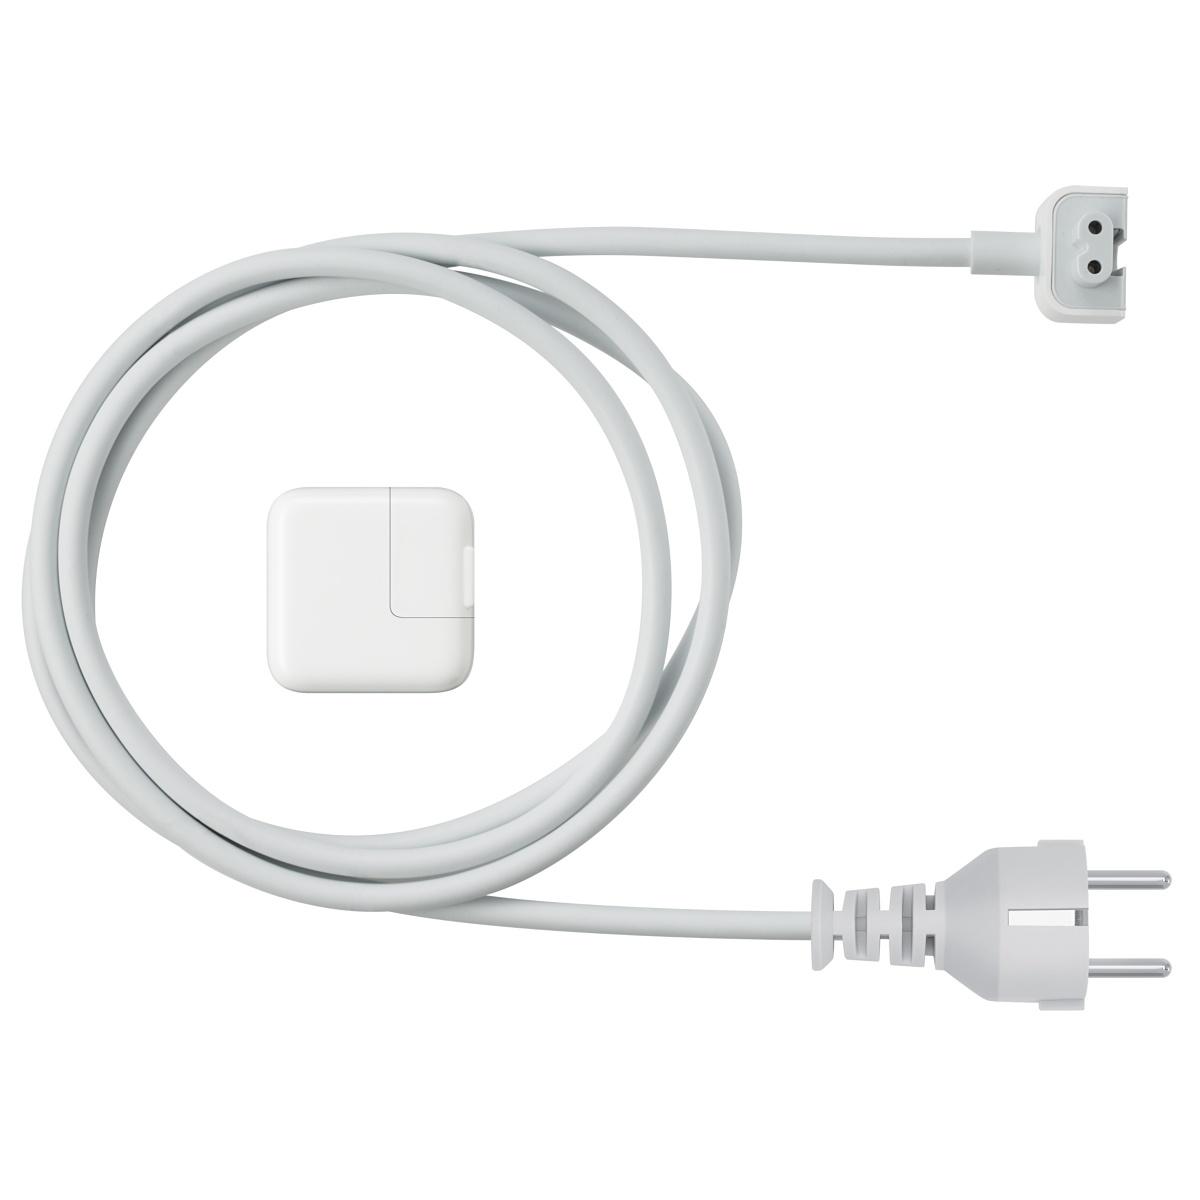 Adaptateur Secteur iPad 1 & 2 Apple MC359ZM/A